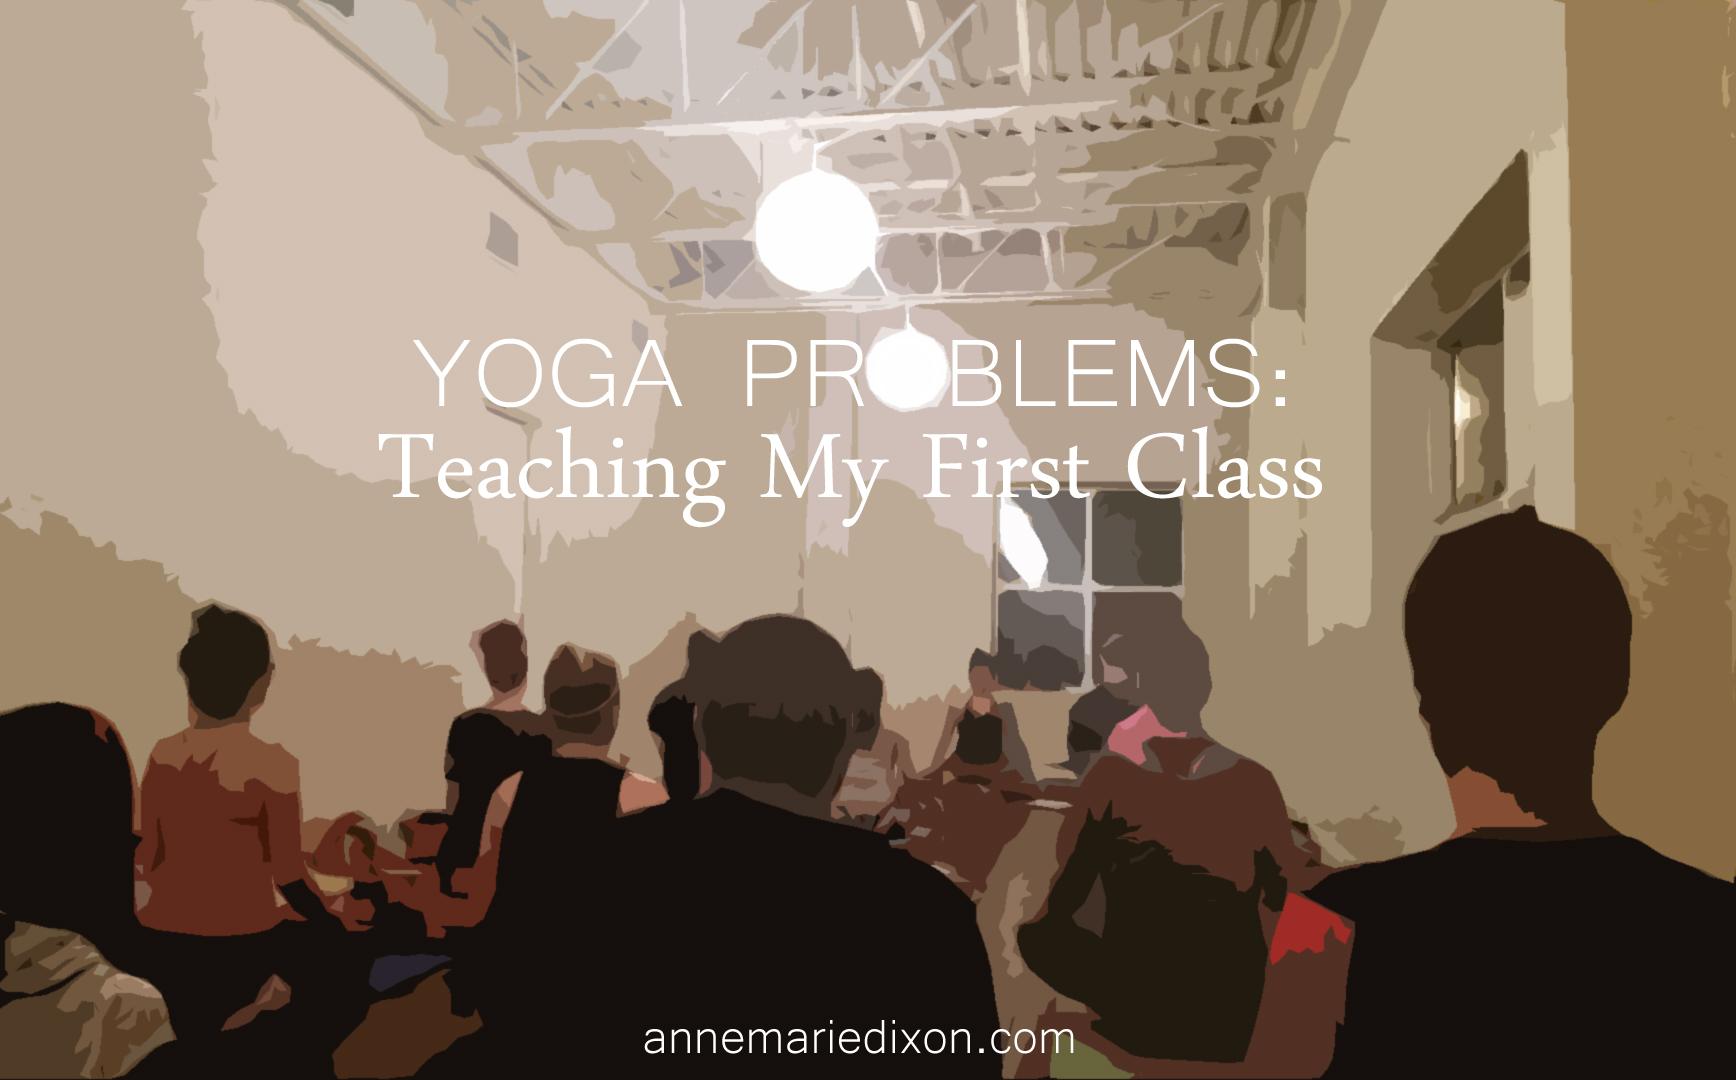 class full of yogis